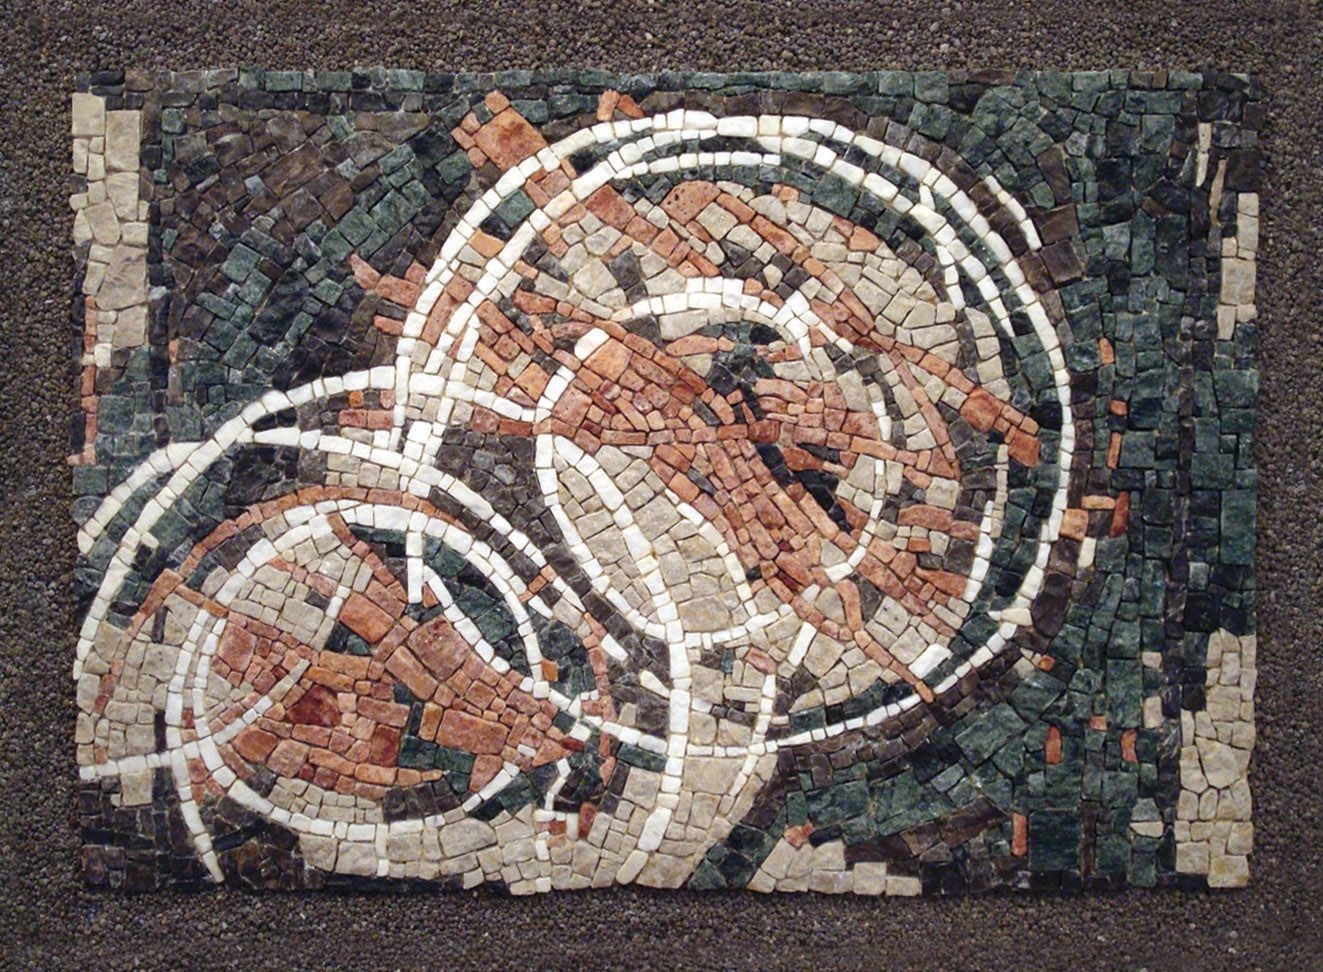 John Touliatos - Cycles. Marbles